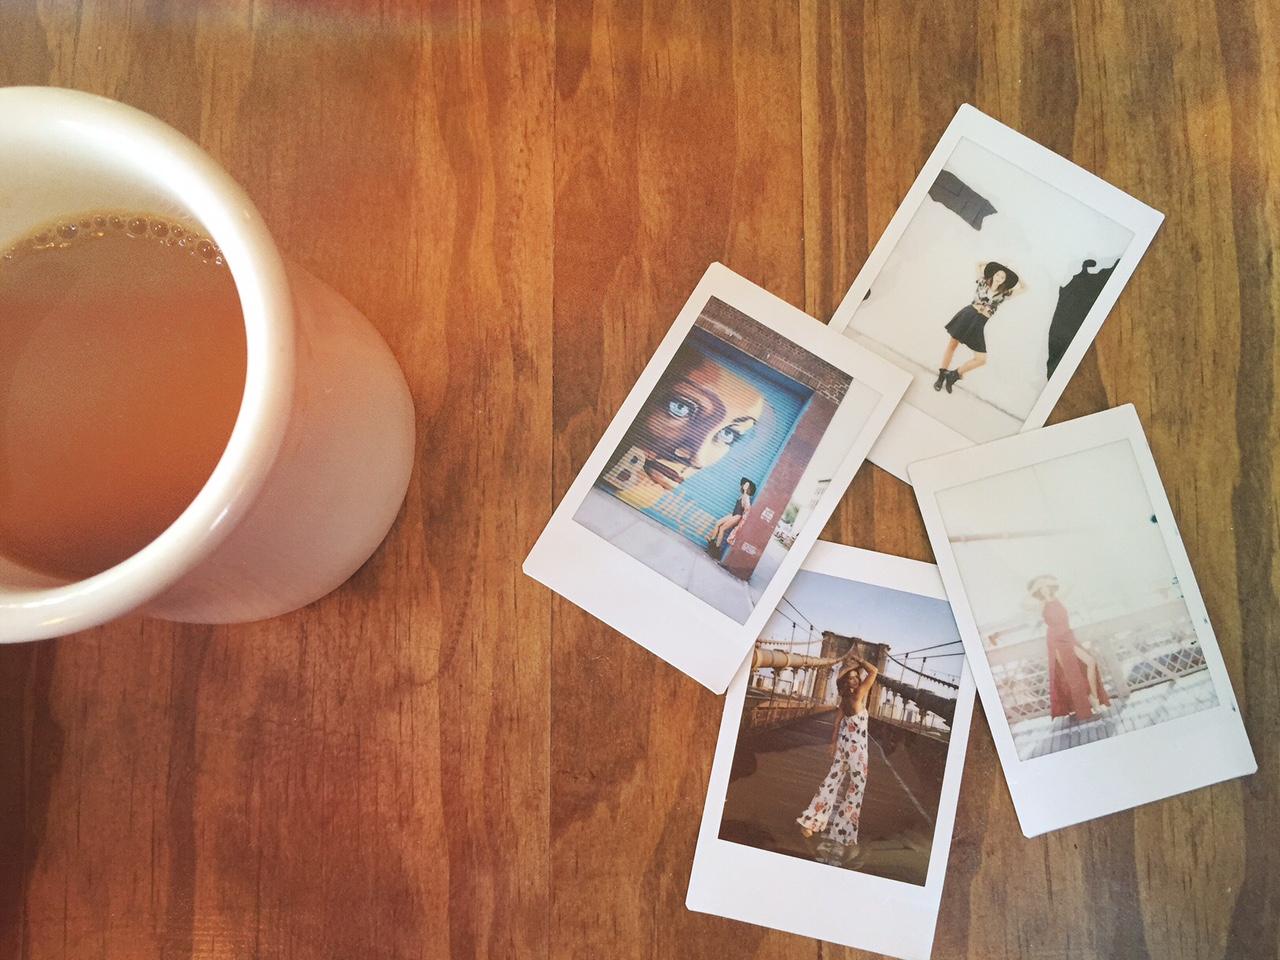 coffee and polaroids